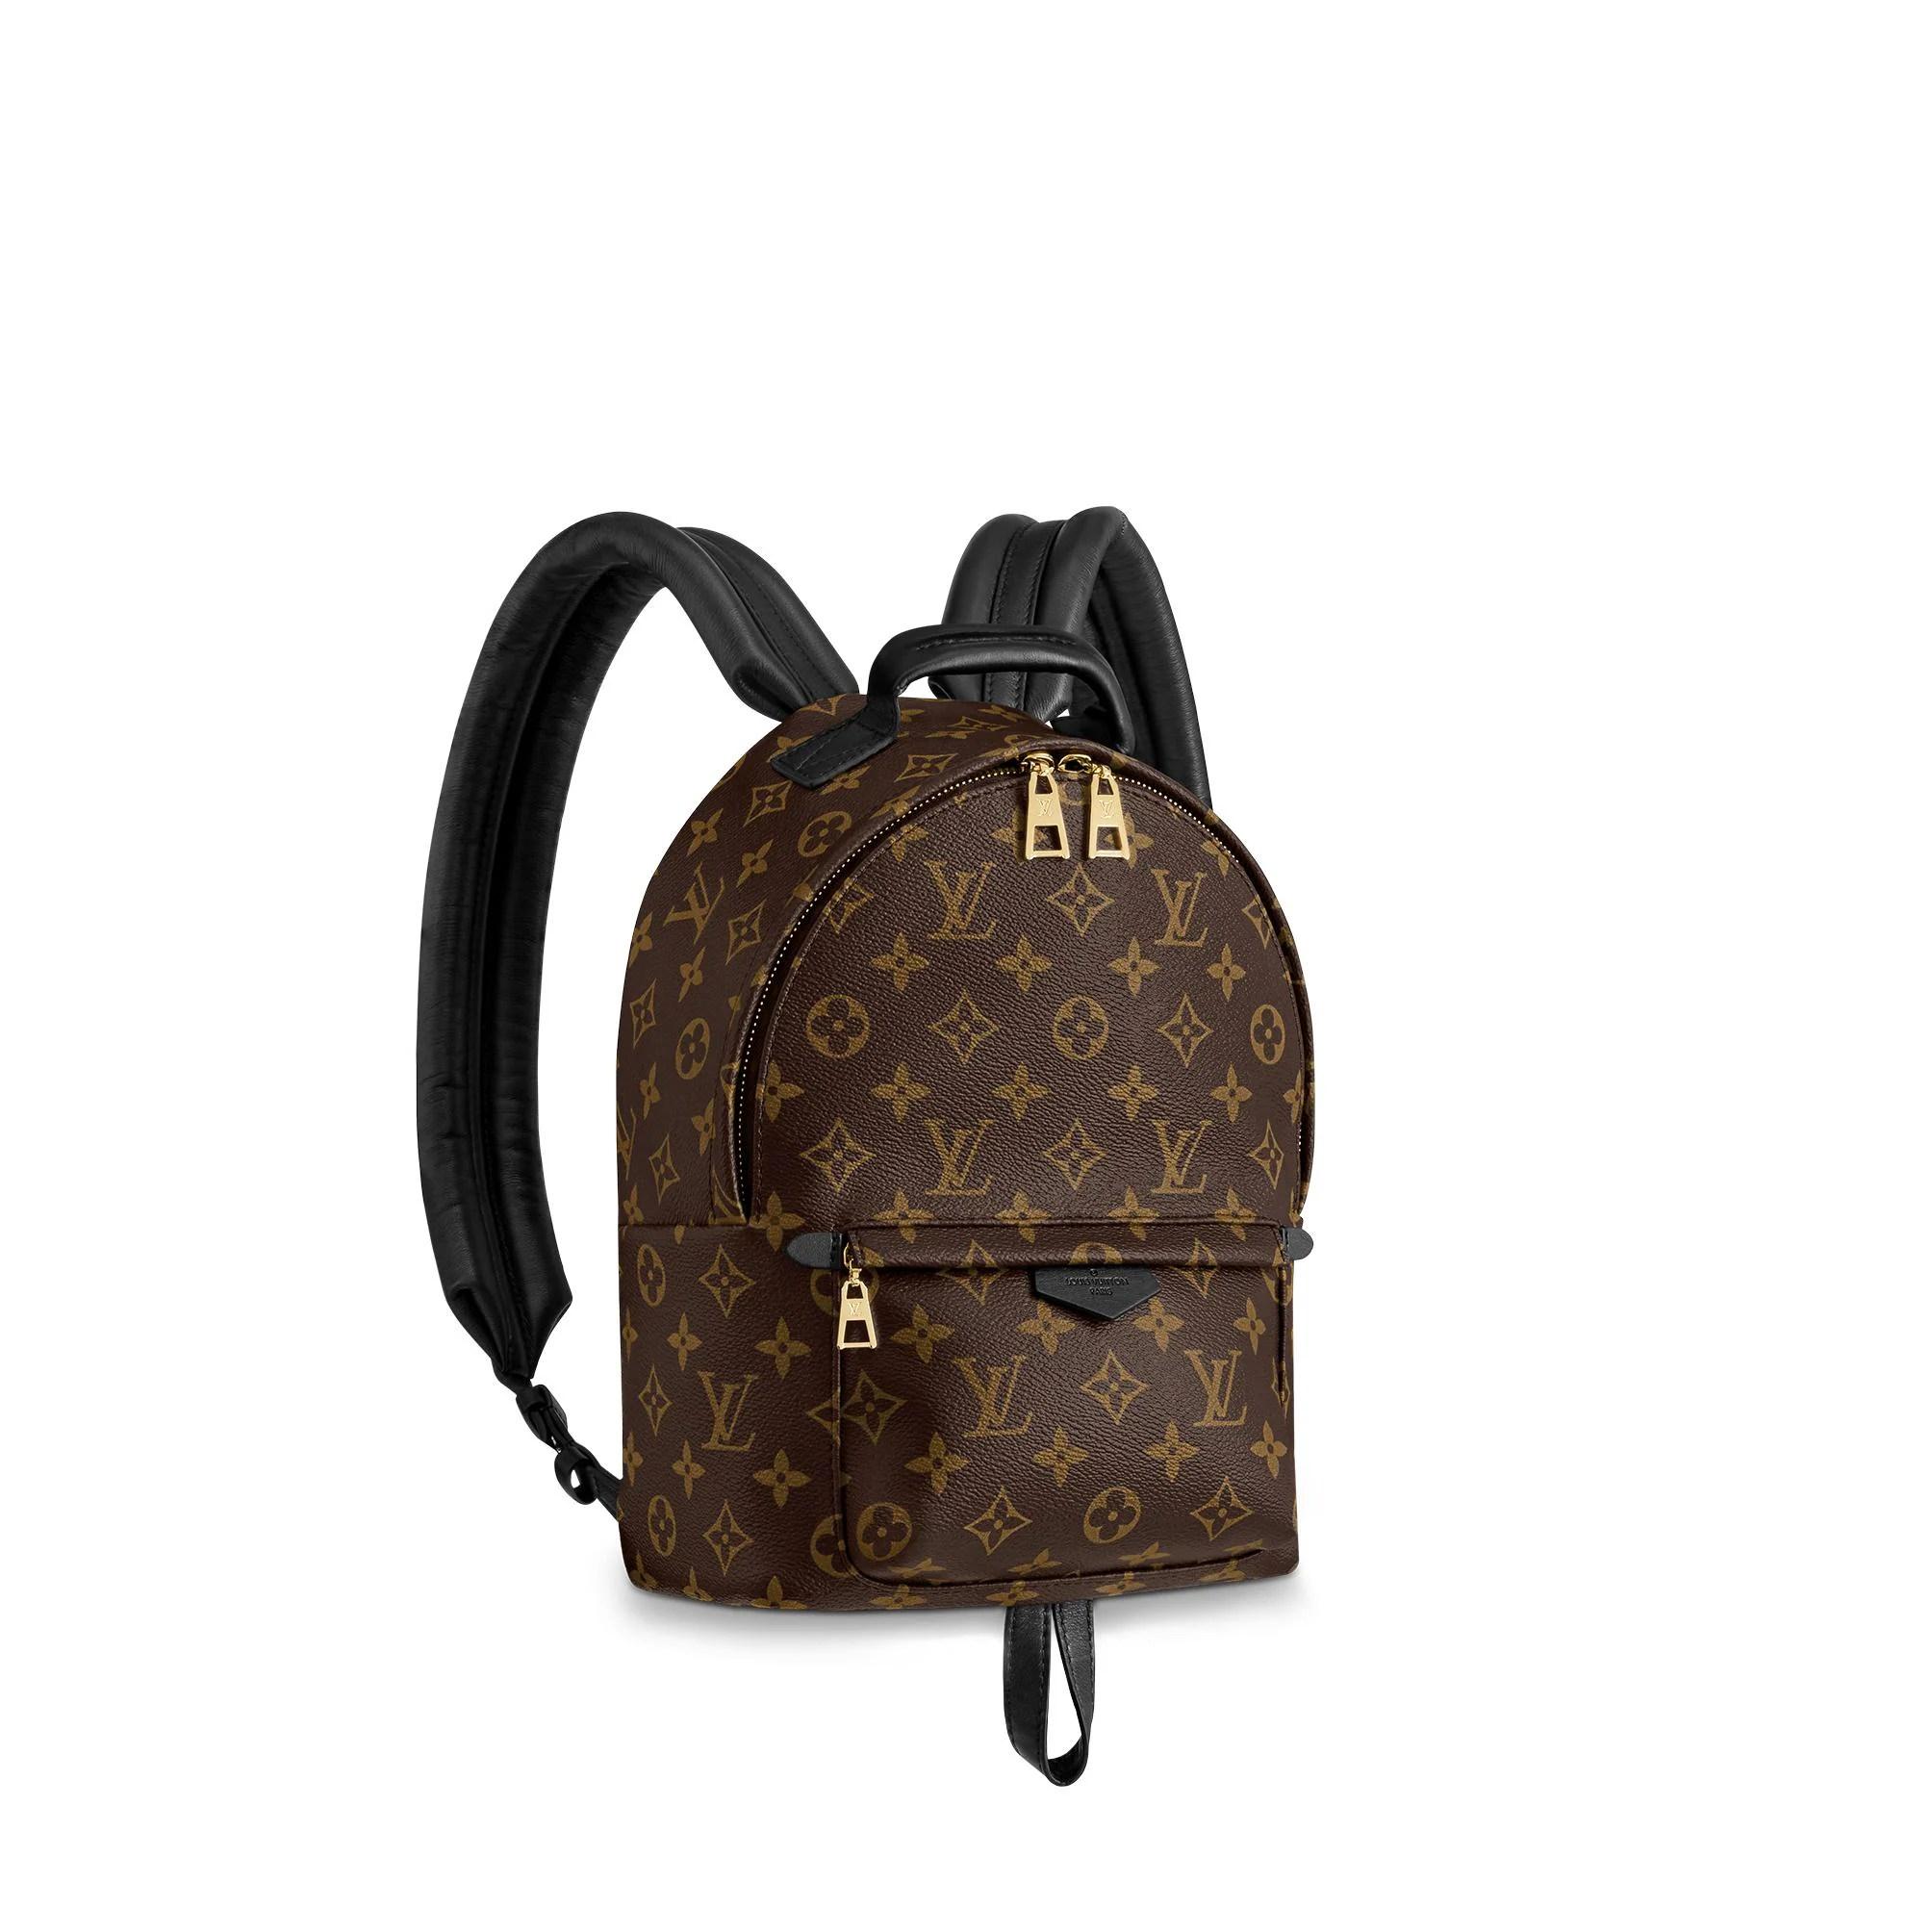 Palm Springs Backpack PM Monogram Handbags LOUIS VUITTON